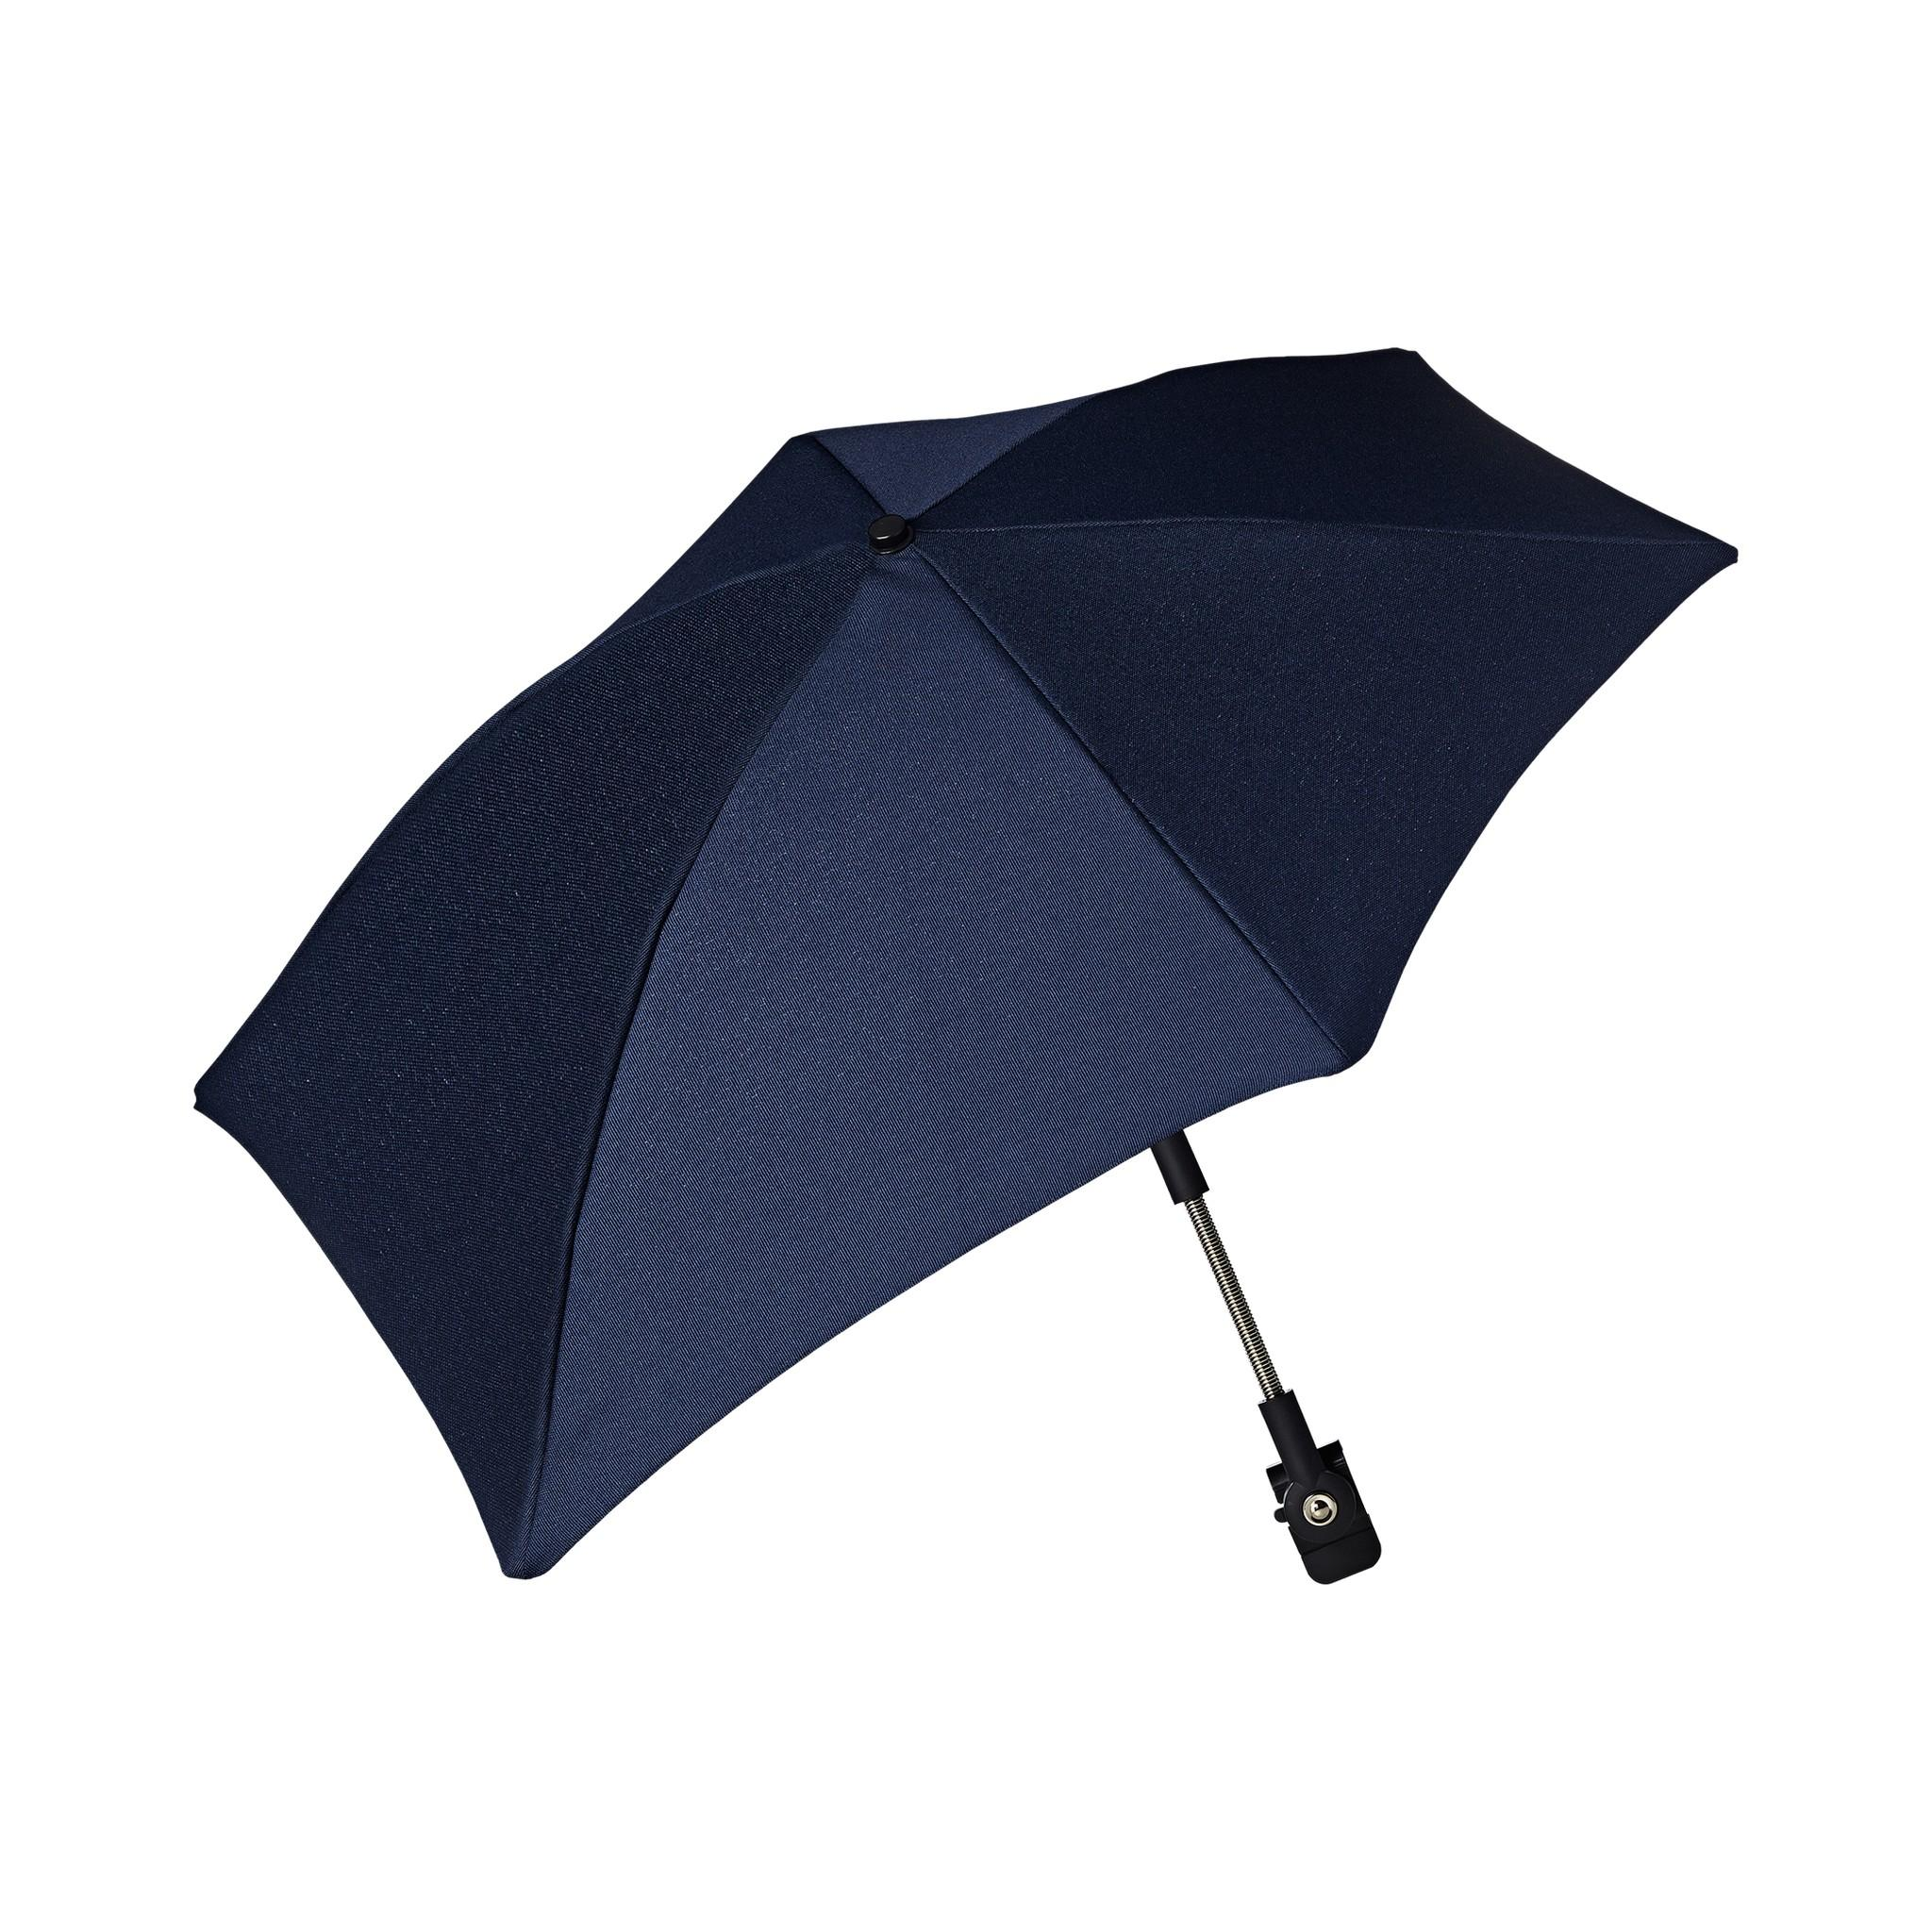 Joolz - Day/Geo parasol - Classic blue